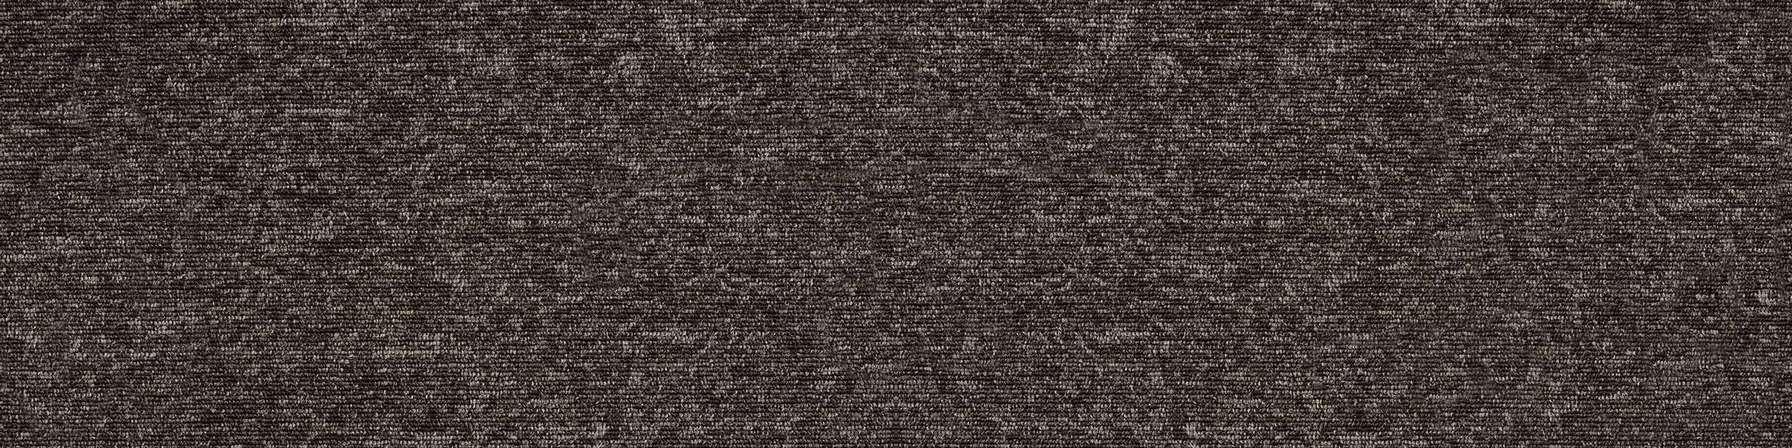 tivoli 21142 antigua steel carpet plank